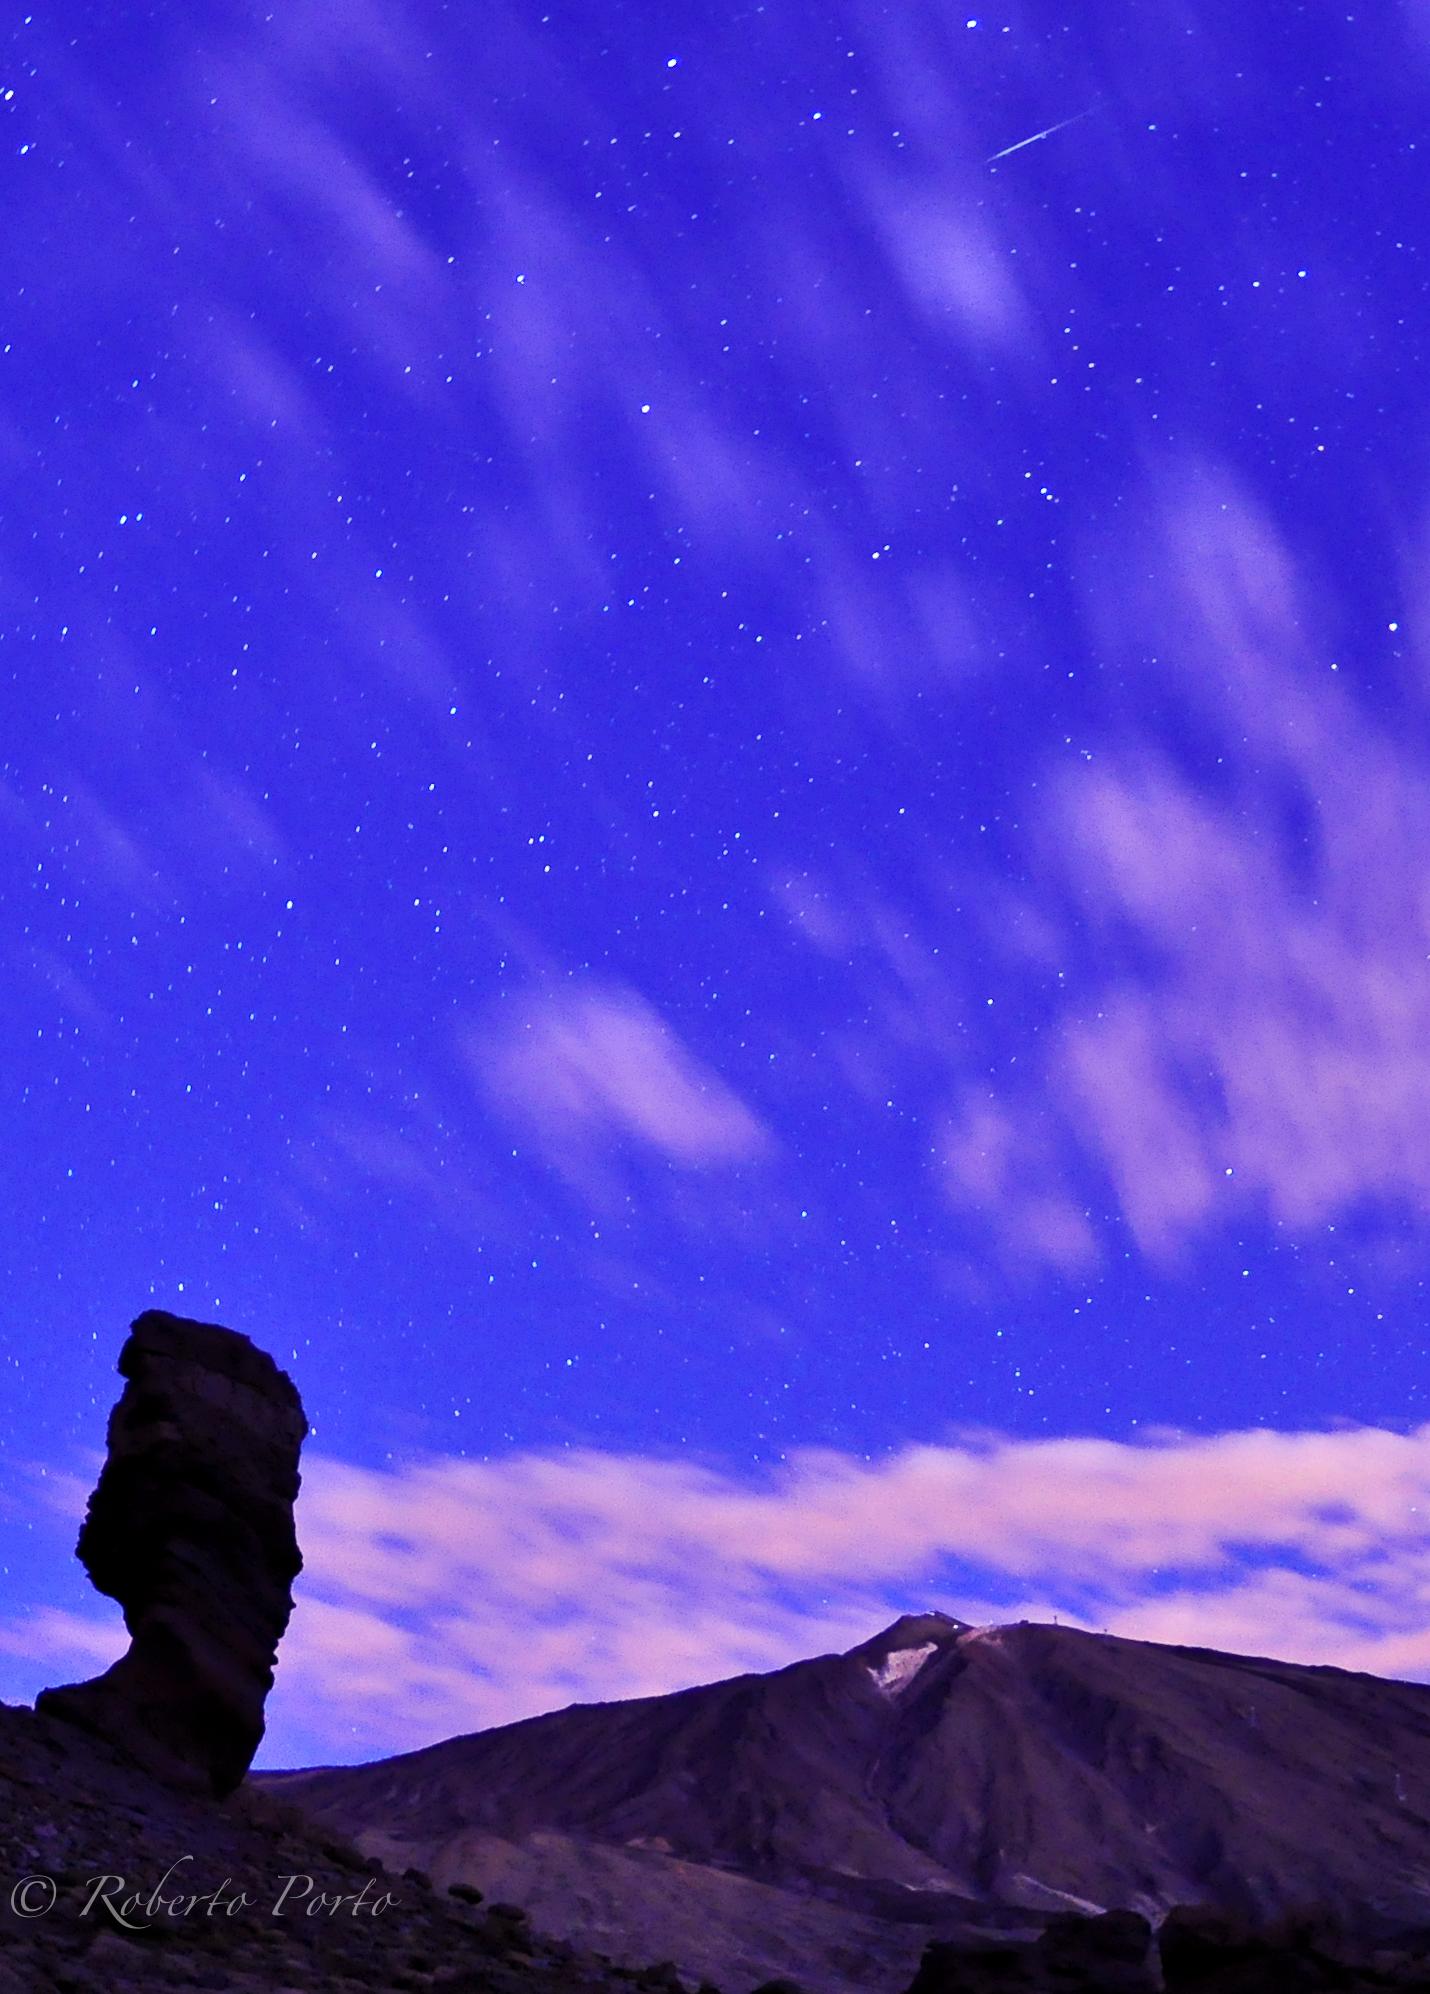 2012 Quadrantid Meteors by Roberto Porto